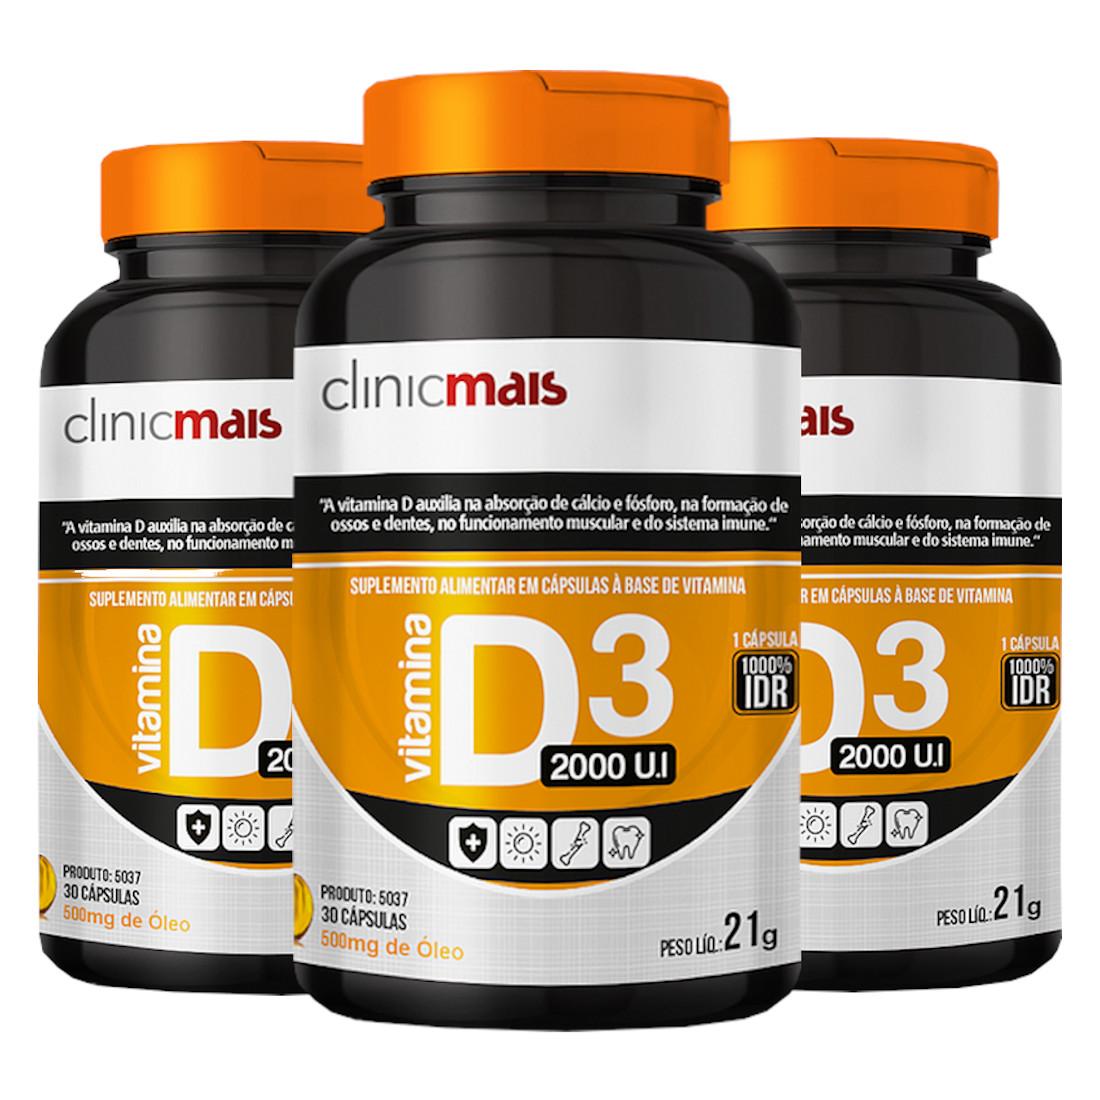 Vitamina D3 Óleo 2000 U.I. 30 cápsulas de 500mg Kit com 3